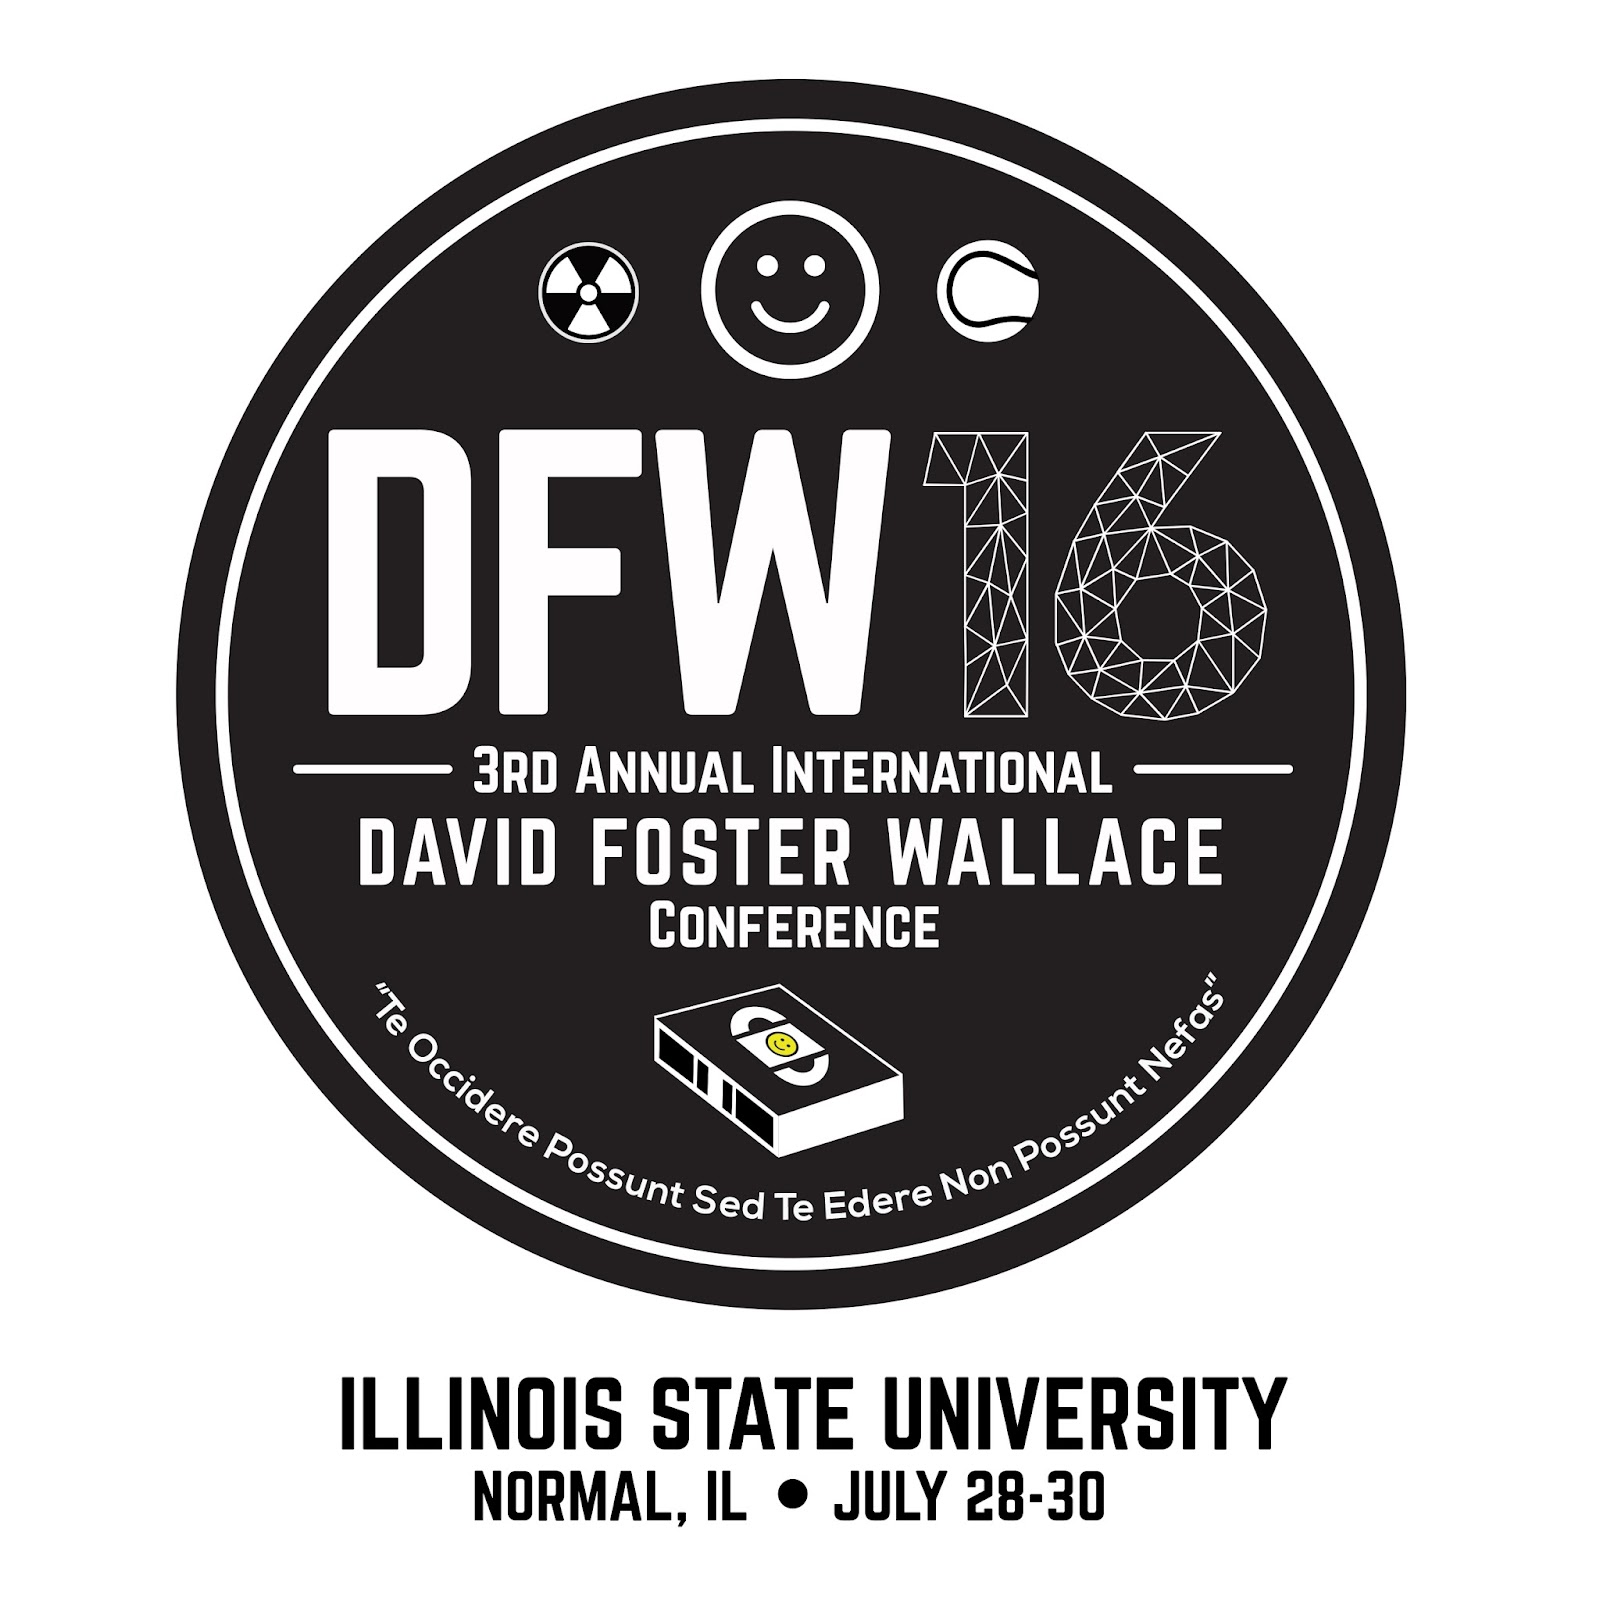 DFW-16-conference-logo.jpg